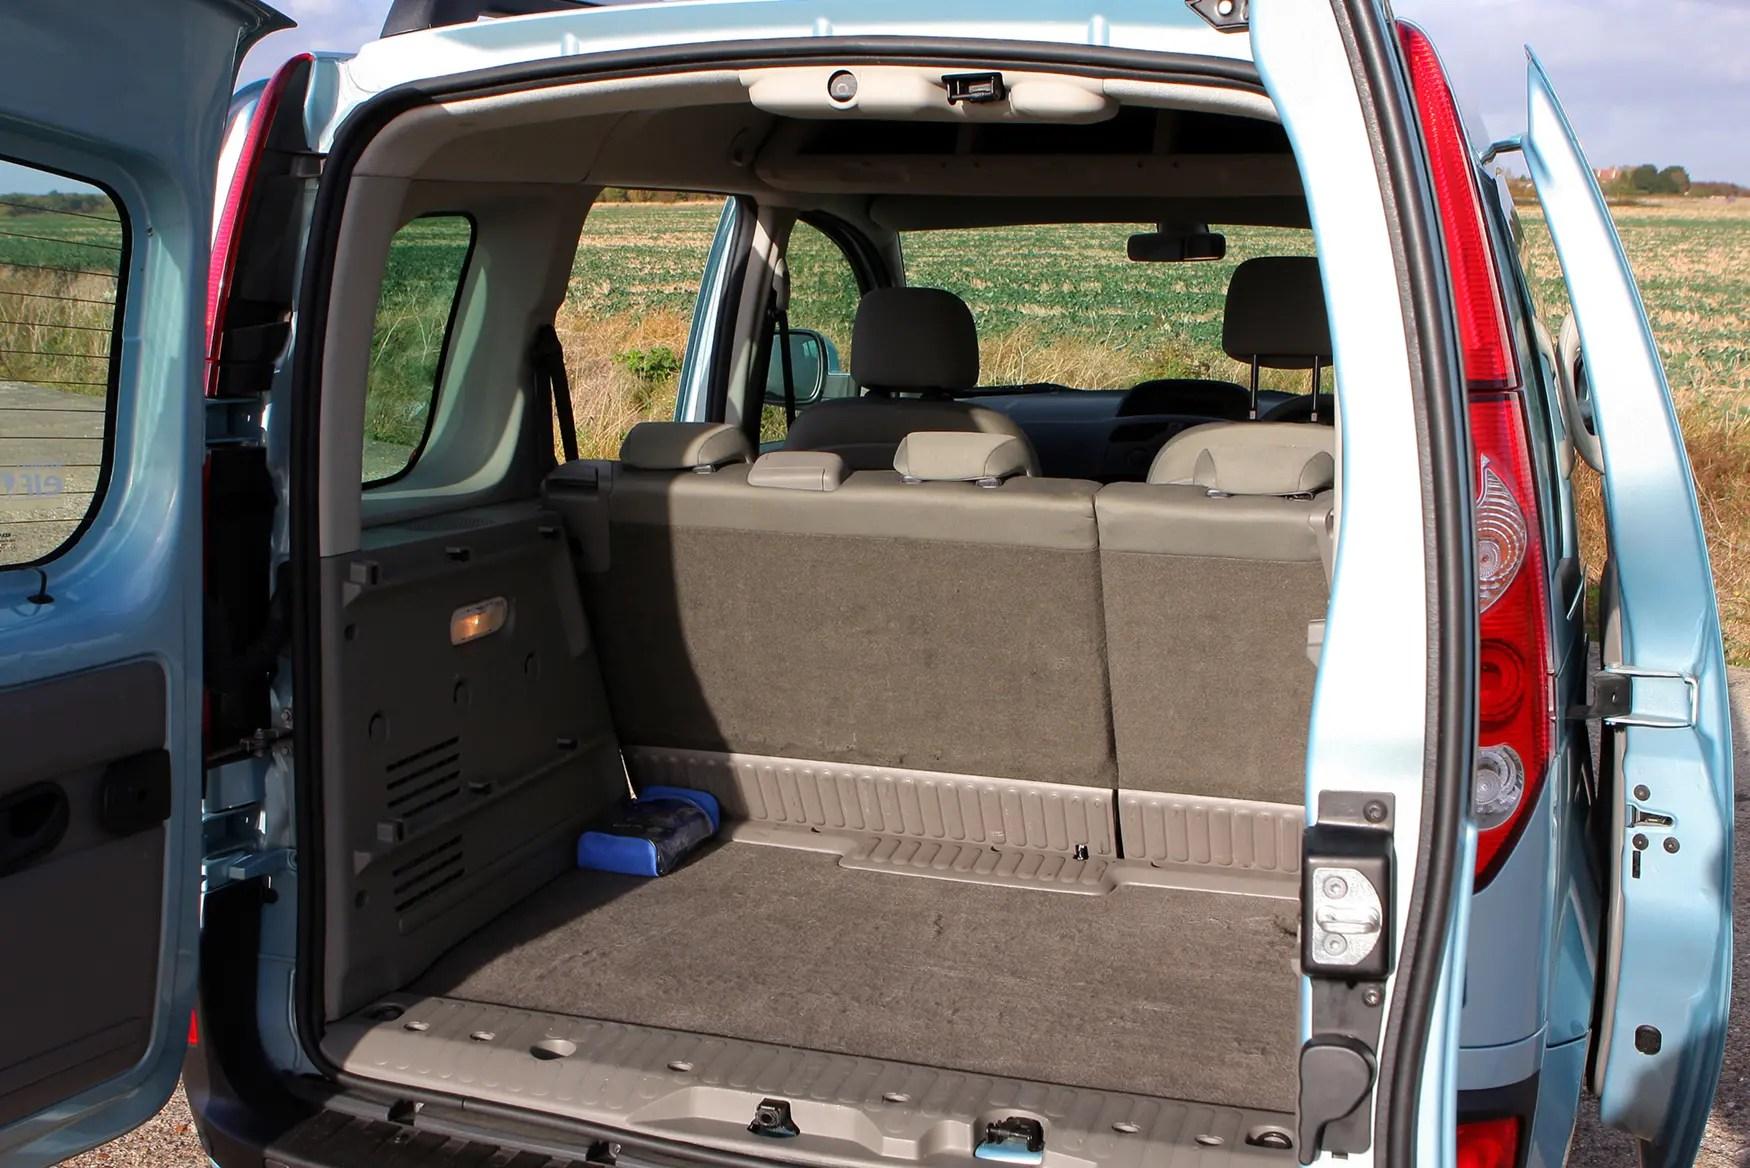 cozy dimension renault kangoo renault kangoo load dimensions usefulresults. Black Bedroom Furniture Sets. Home Design Ideas